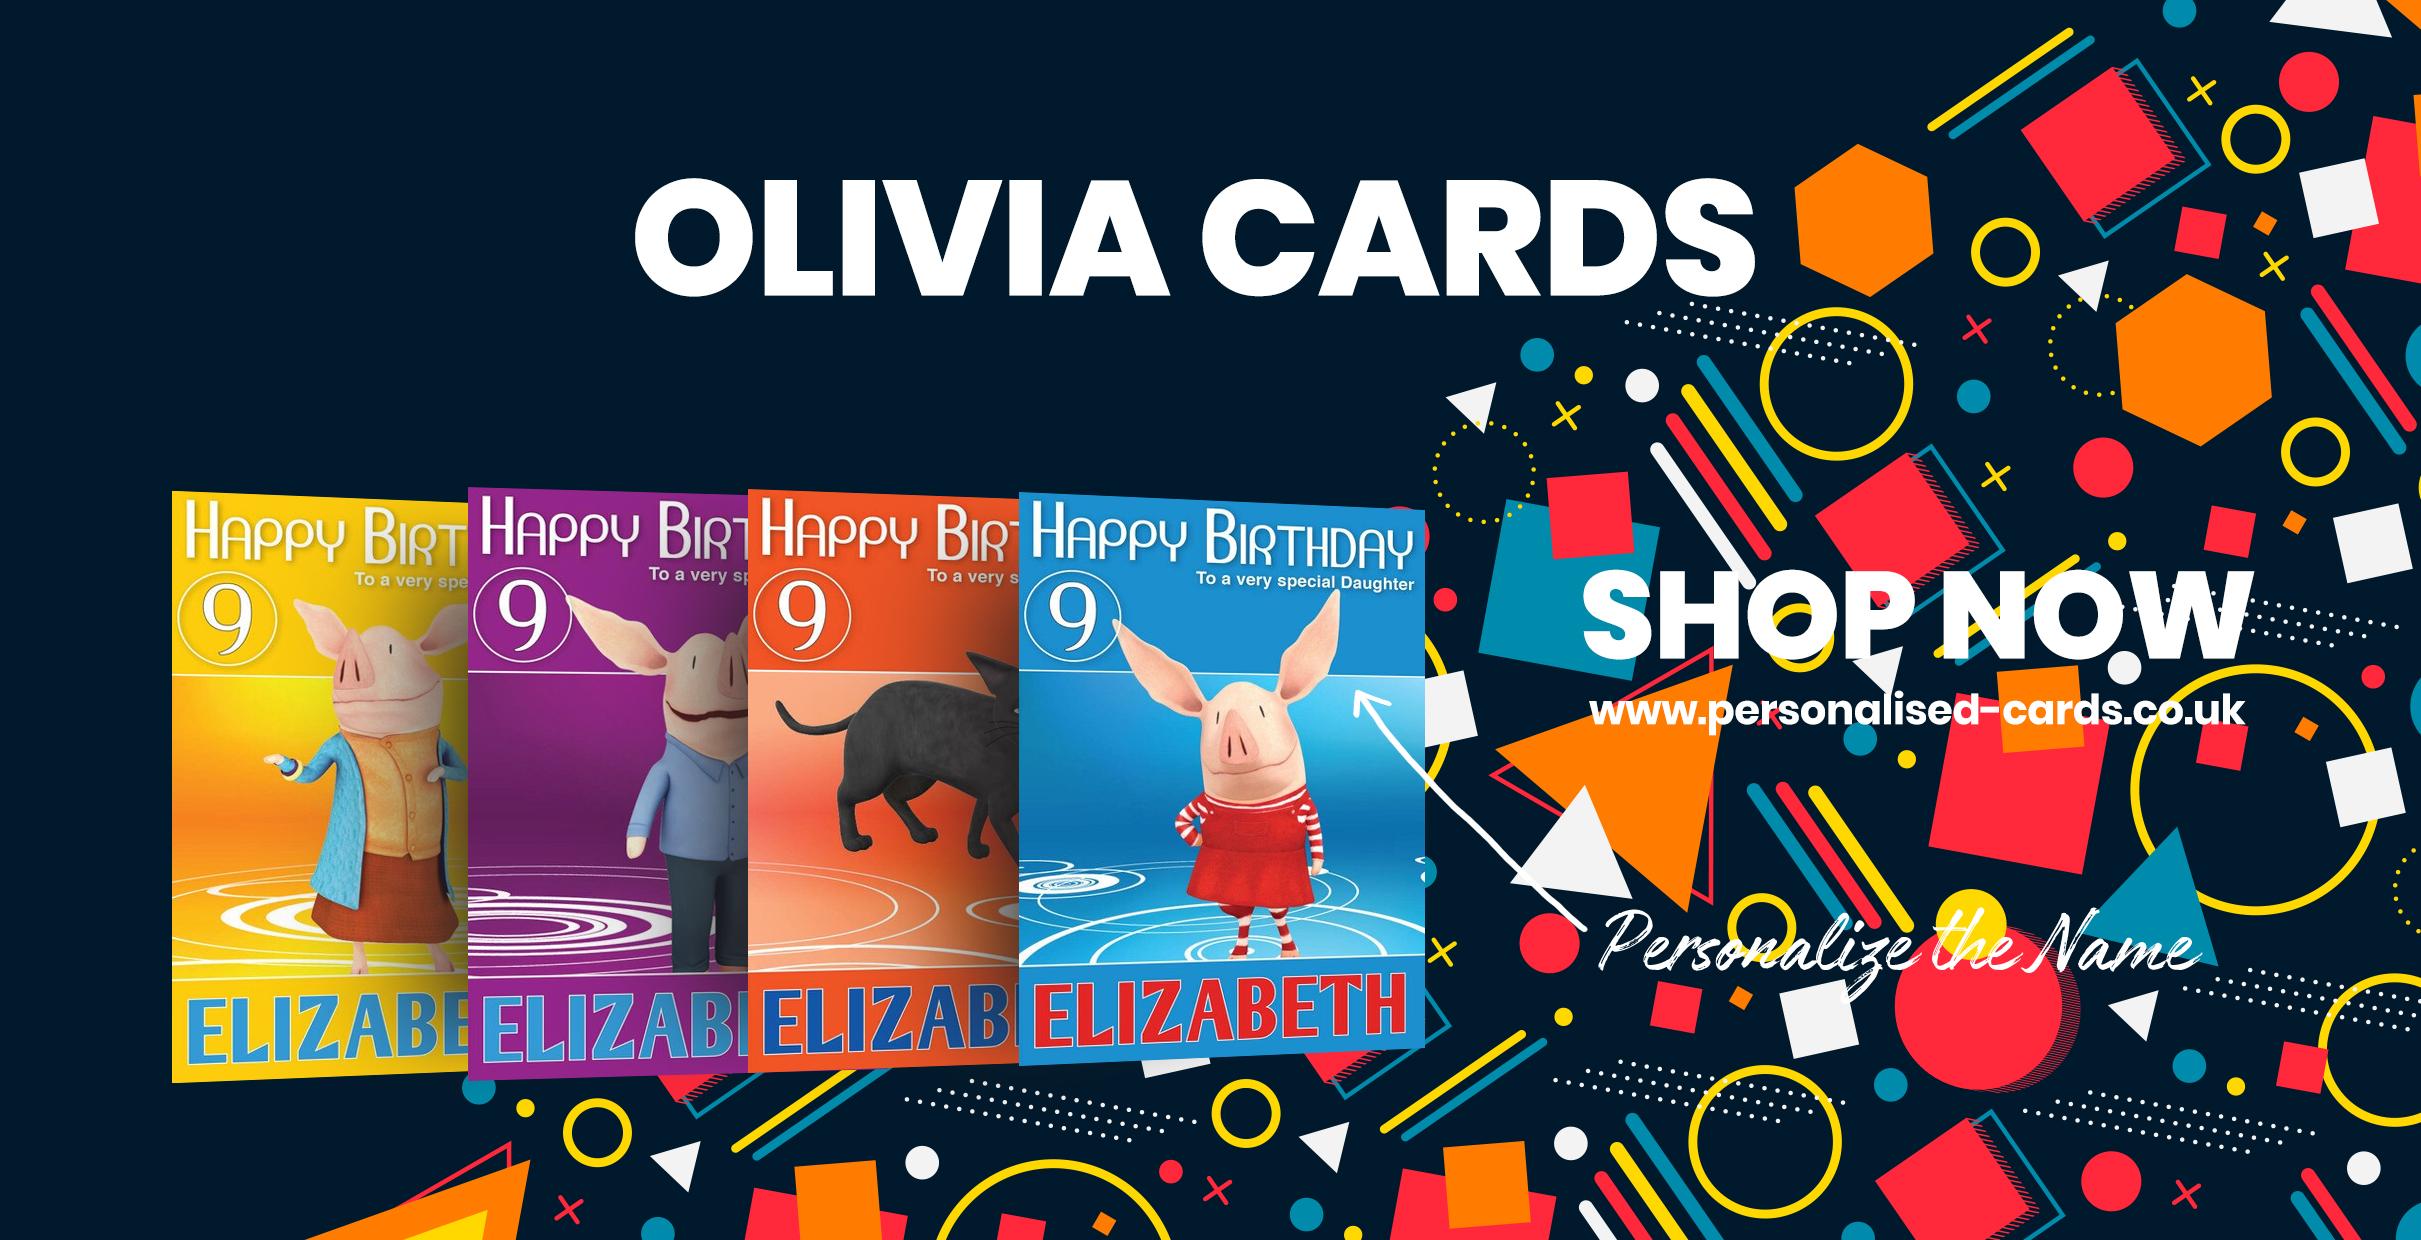 olivia-cards.jpg